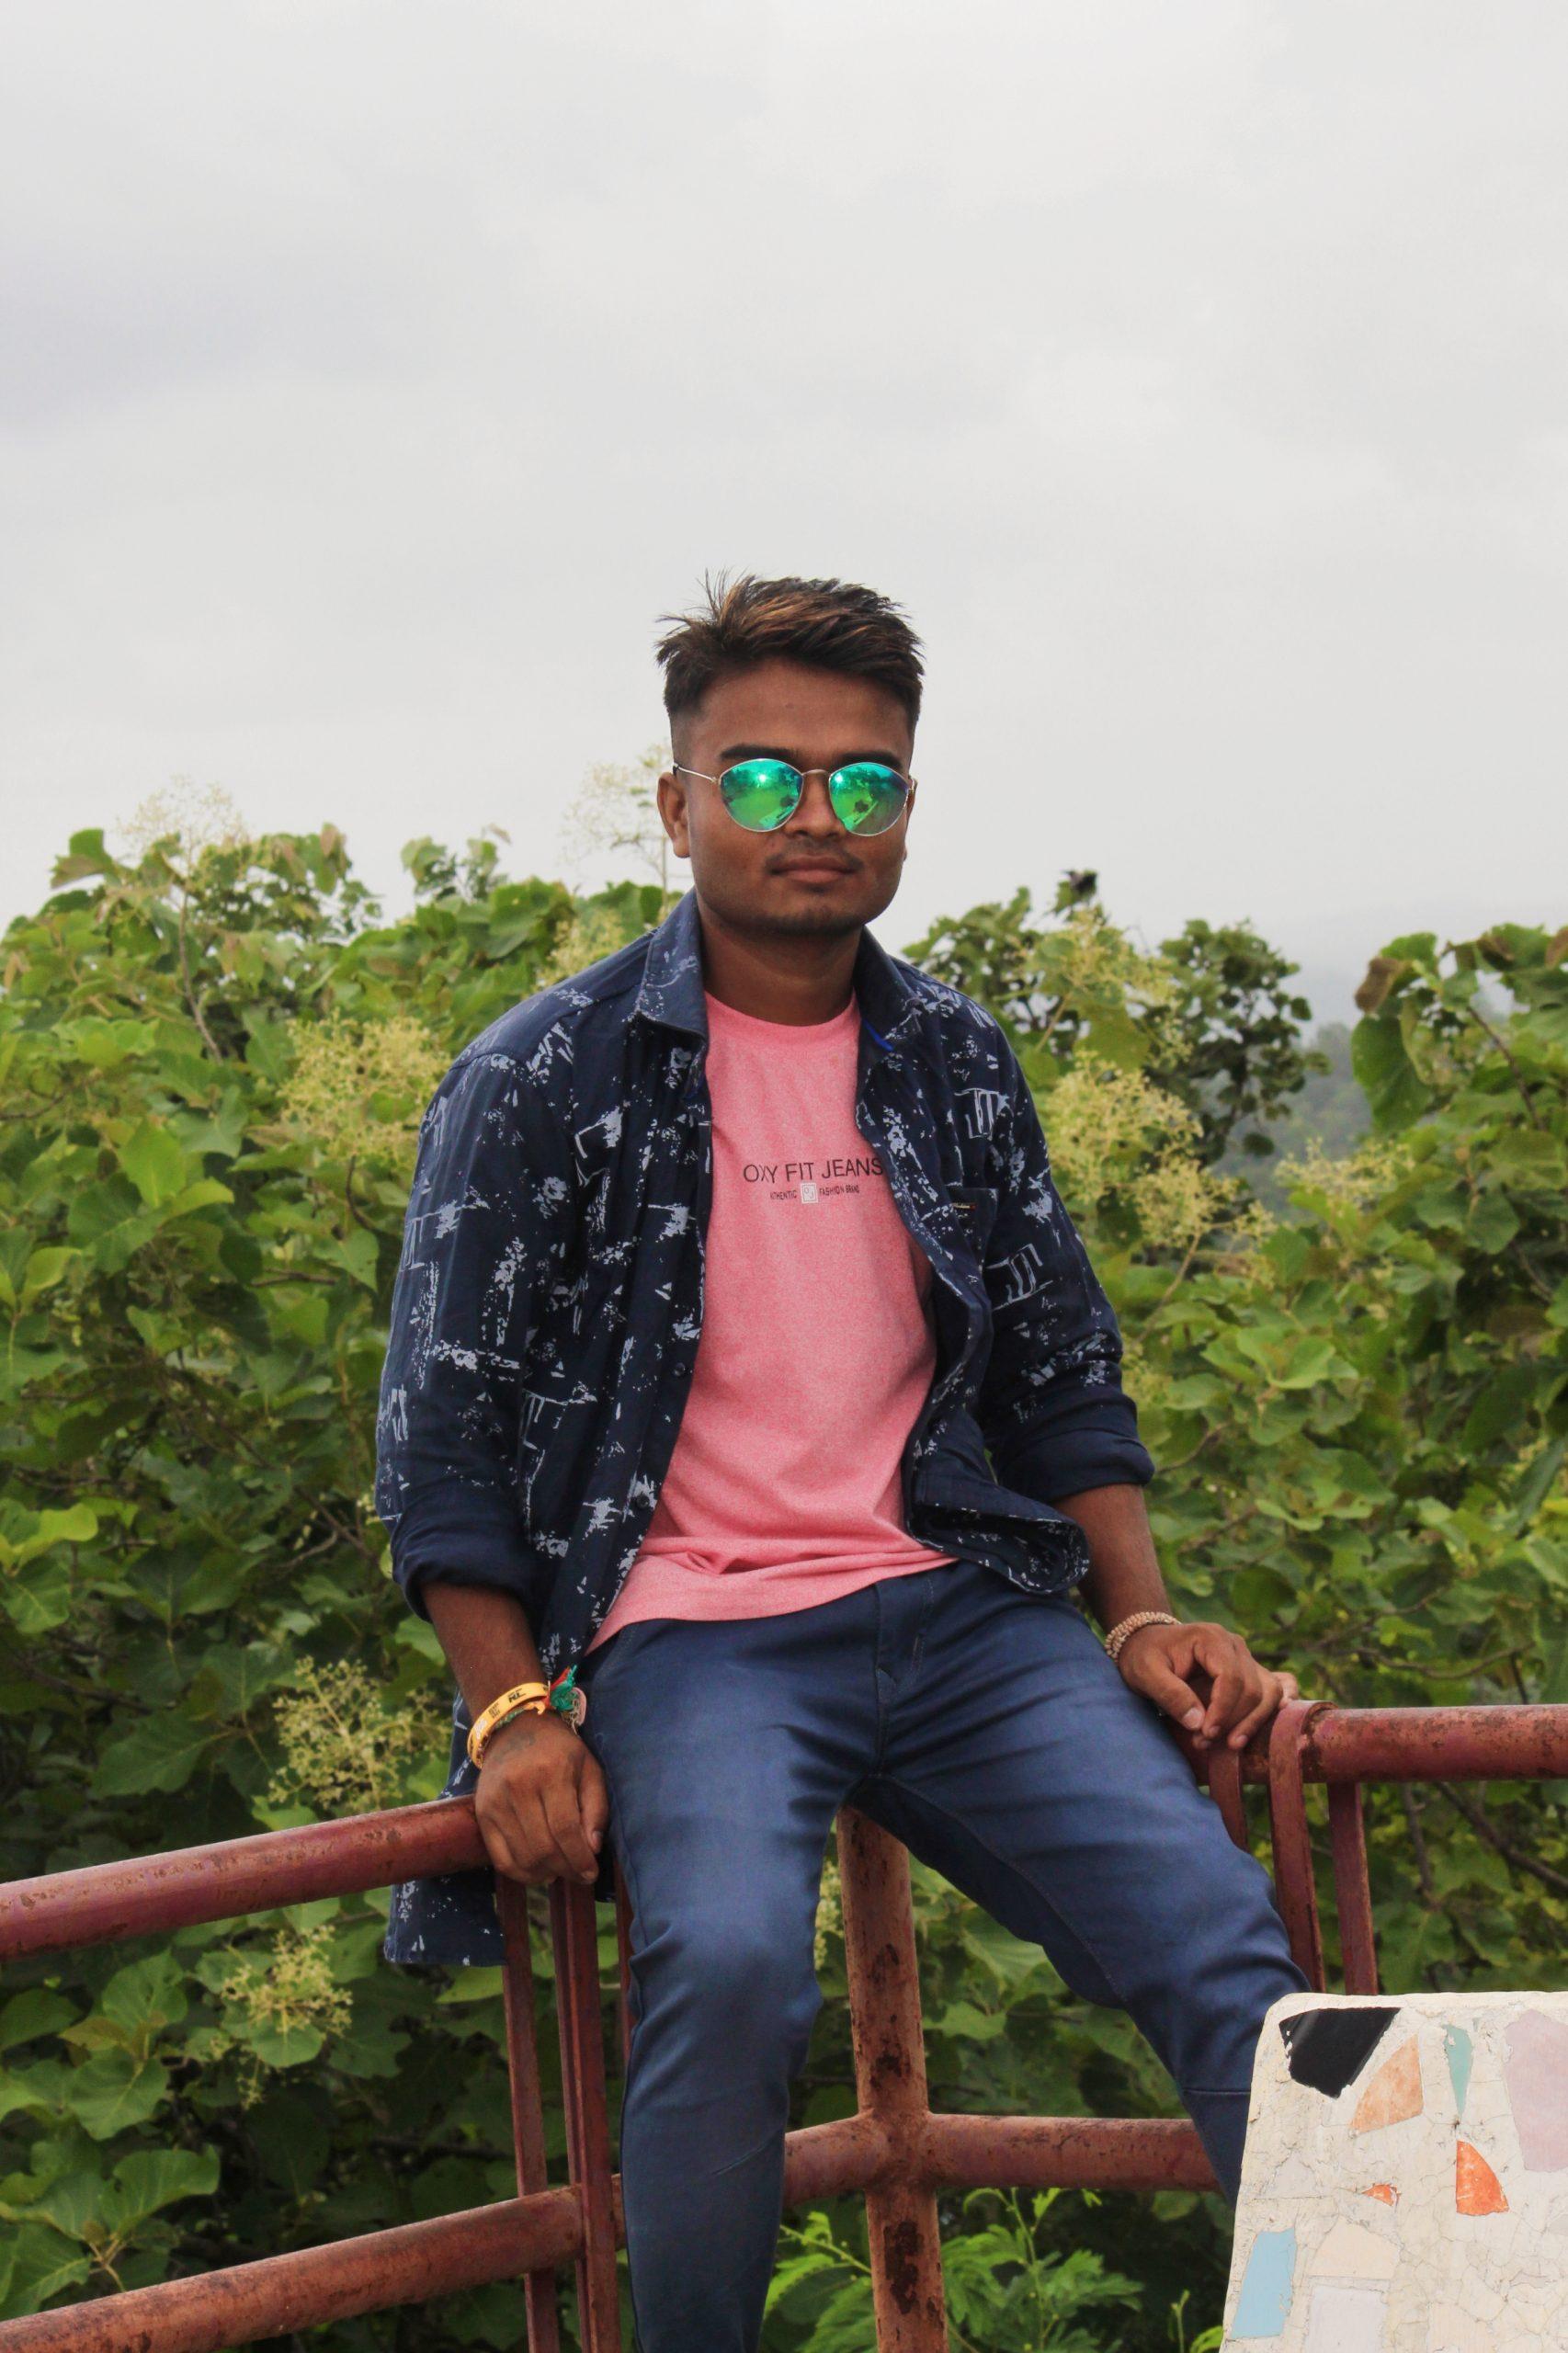 Model posing while sitting on railing